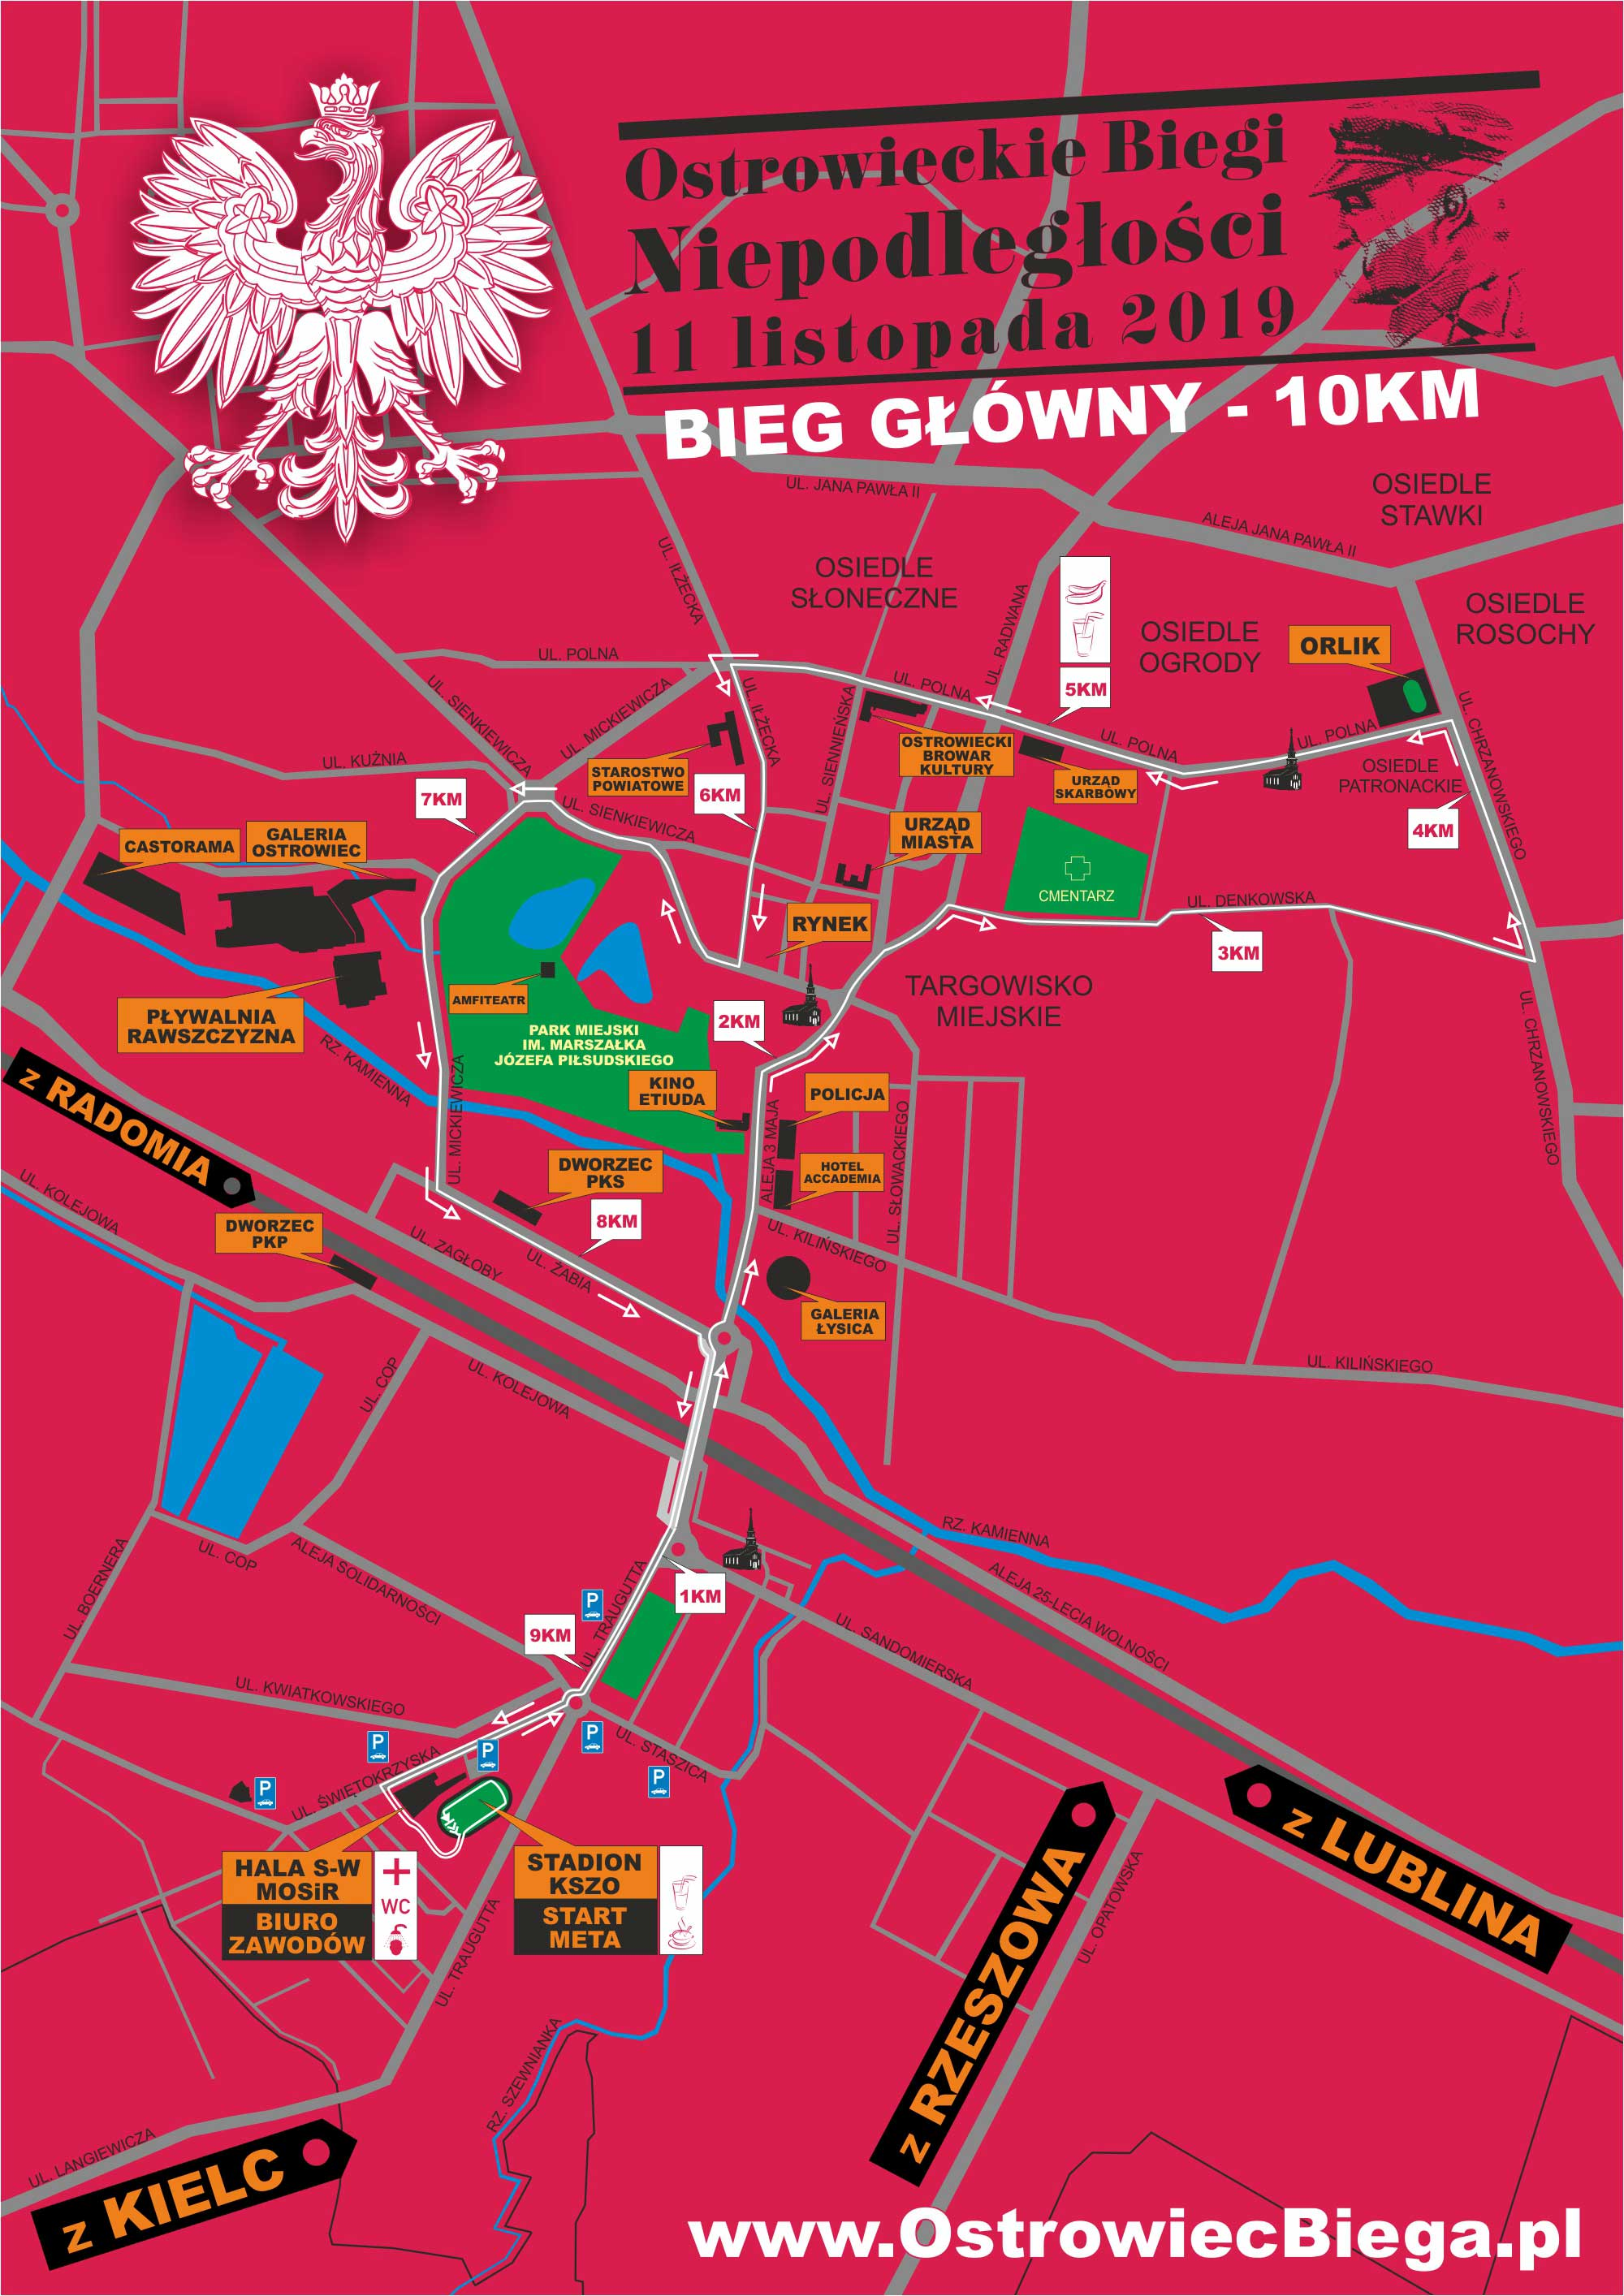 OBN2019 mapa10km